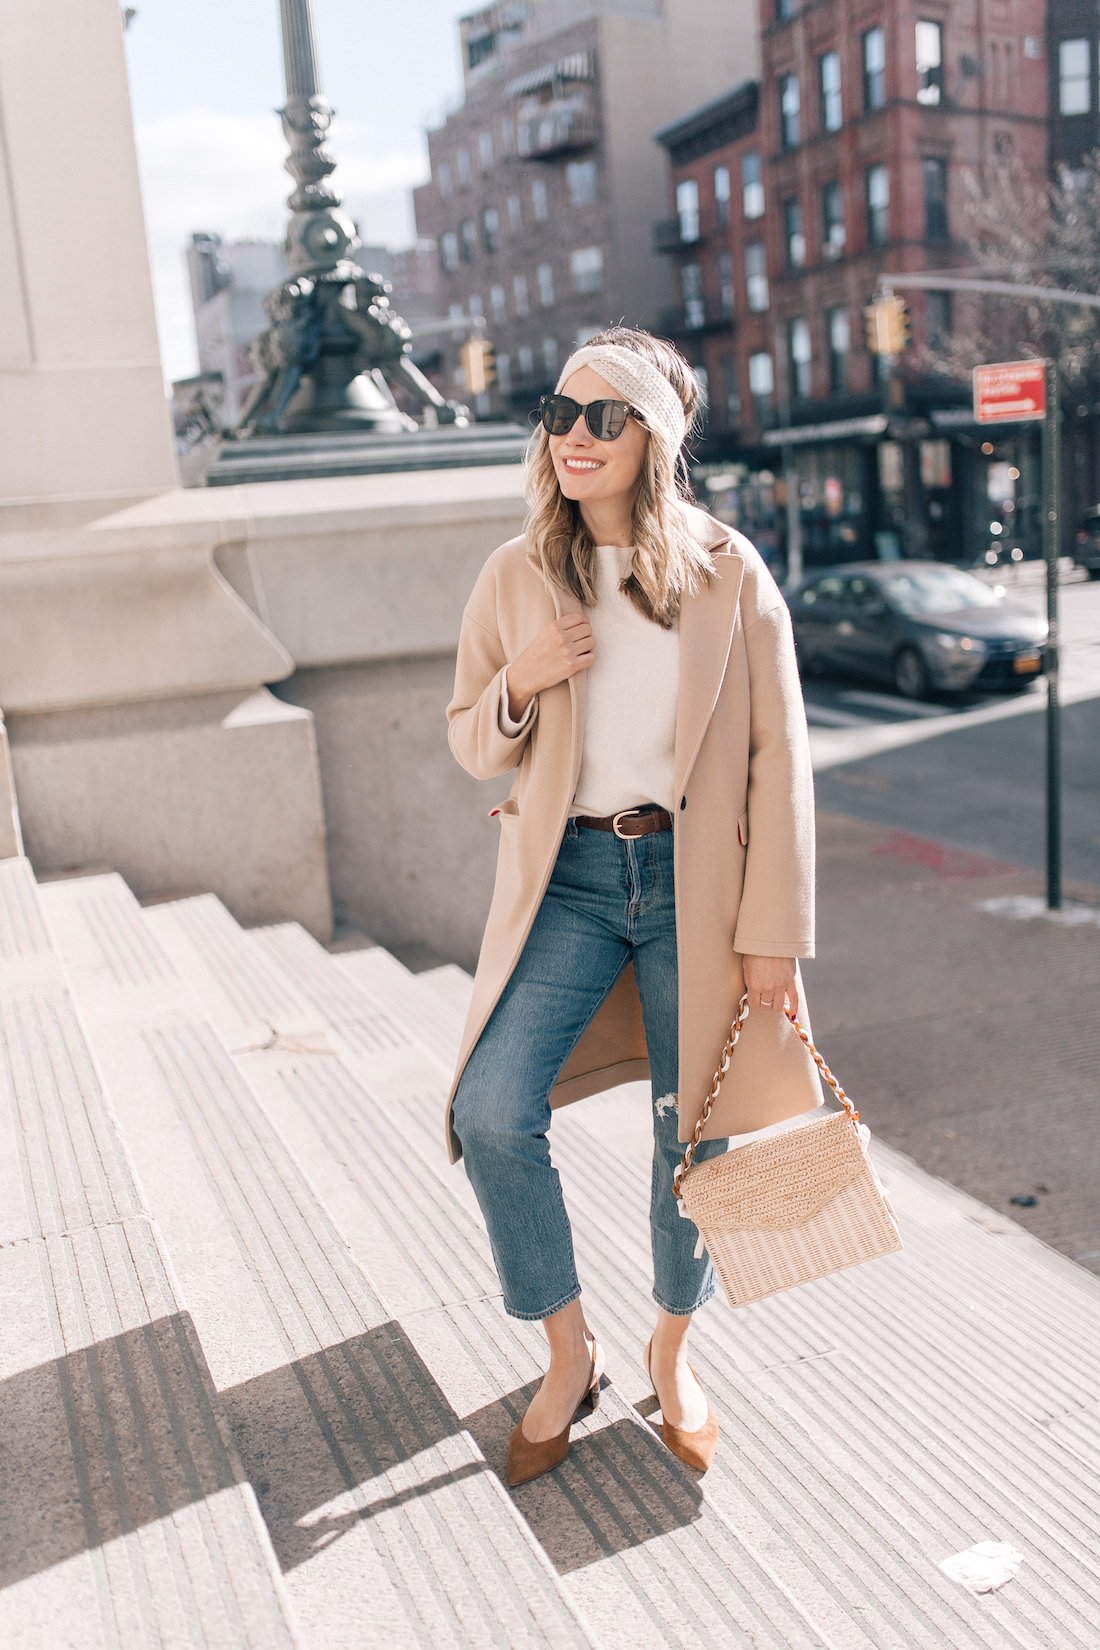 Outfit Details:Topshop Coat(exact) // Eileen Fisher Sweater(c/o) // Eileen Fisher Headband (c/o)// Levi's Jeans // Polaroid Sunglasses // Pamela Munson Bag (c/o) // Sarah Flint Heels // J.Crew Belt